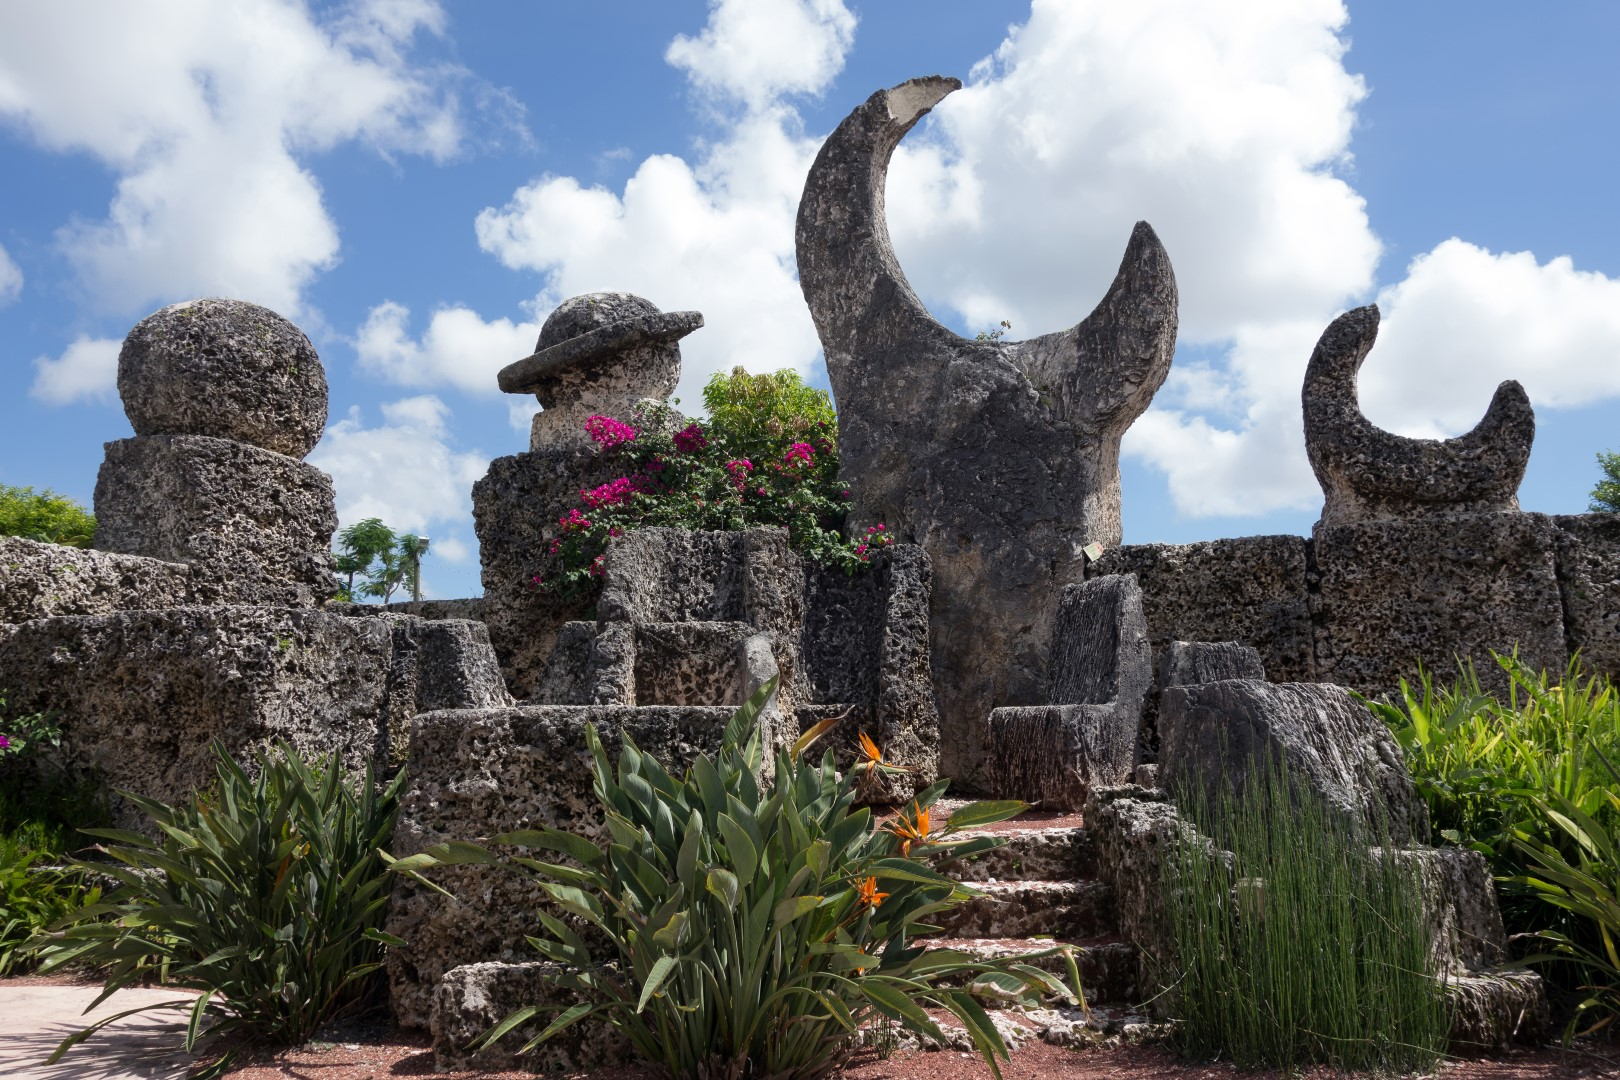 Coral Castle Topo Map MiamiDade County FL Homestead Area - Florida quad map